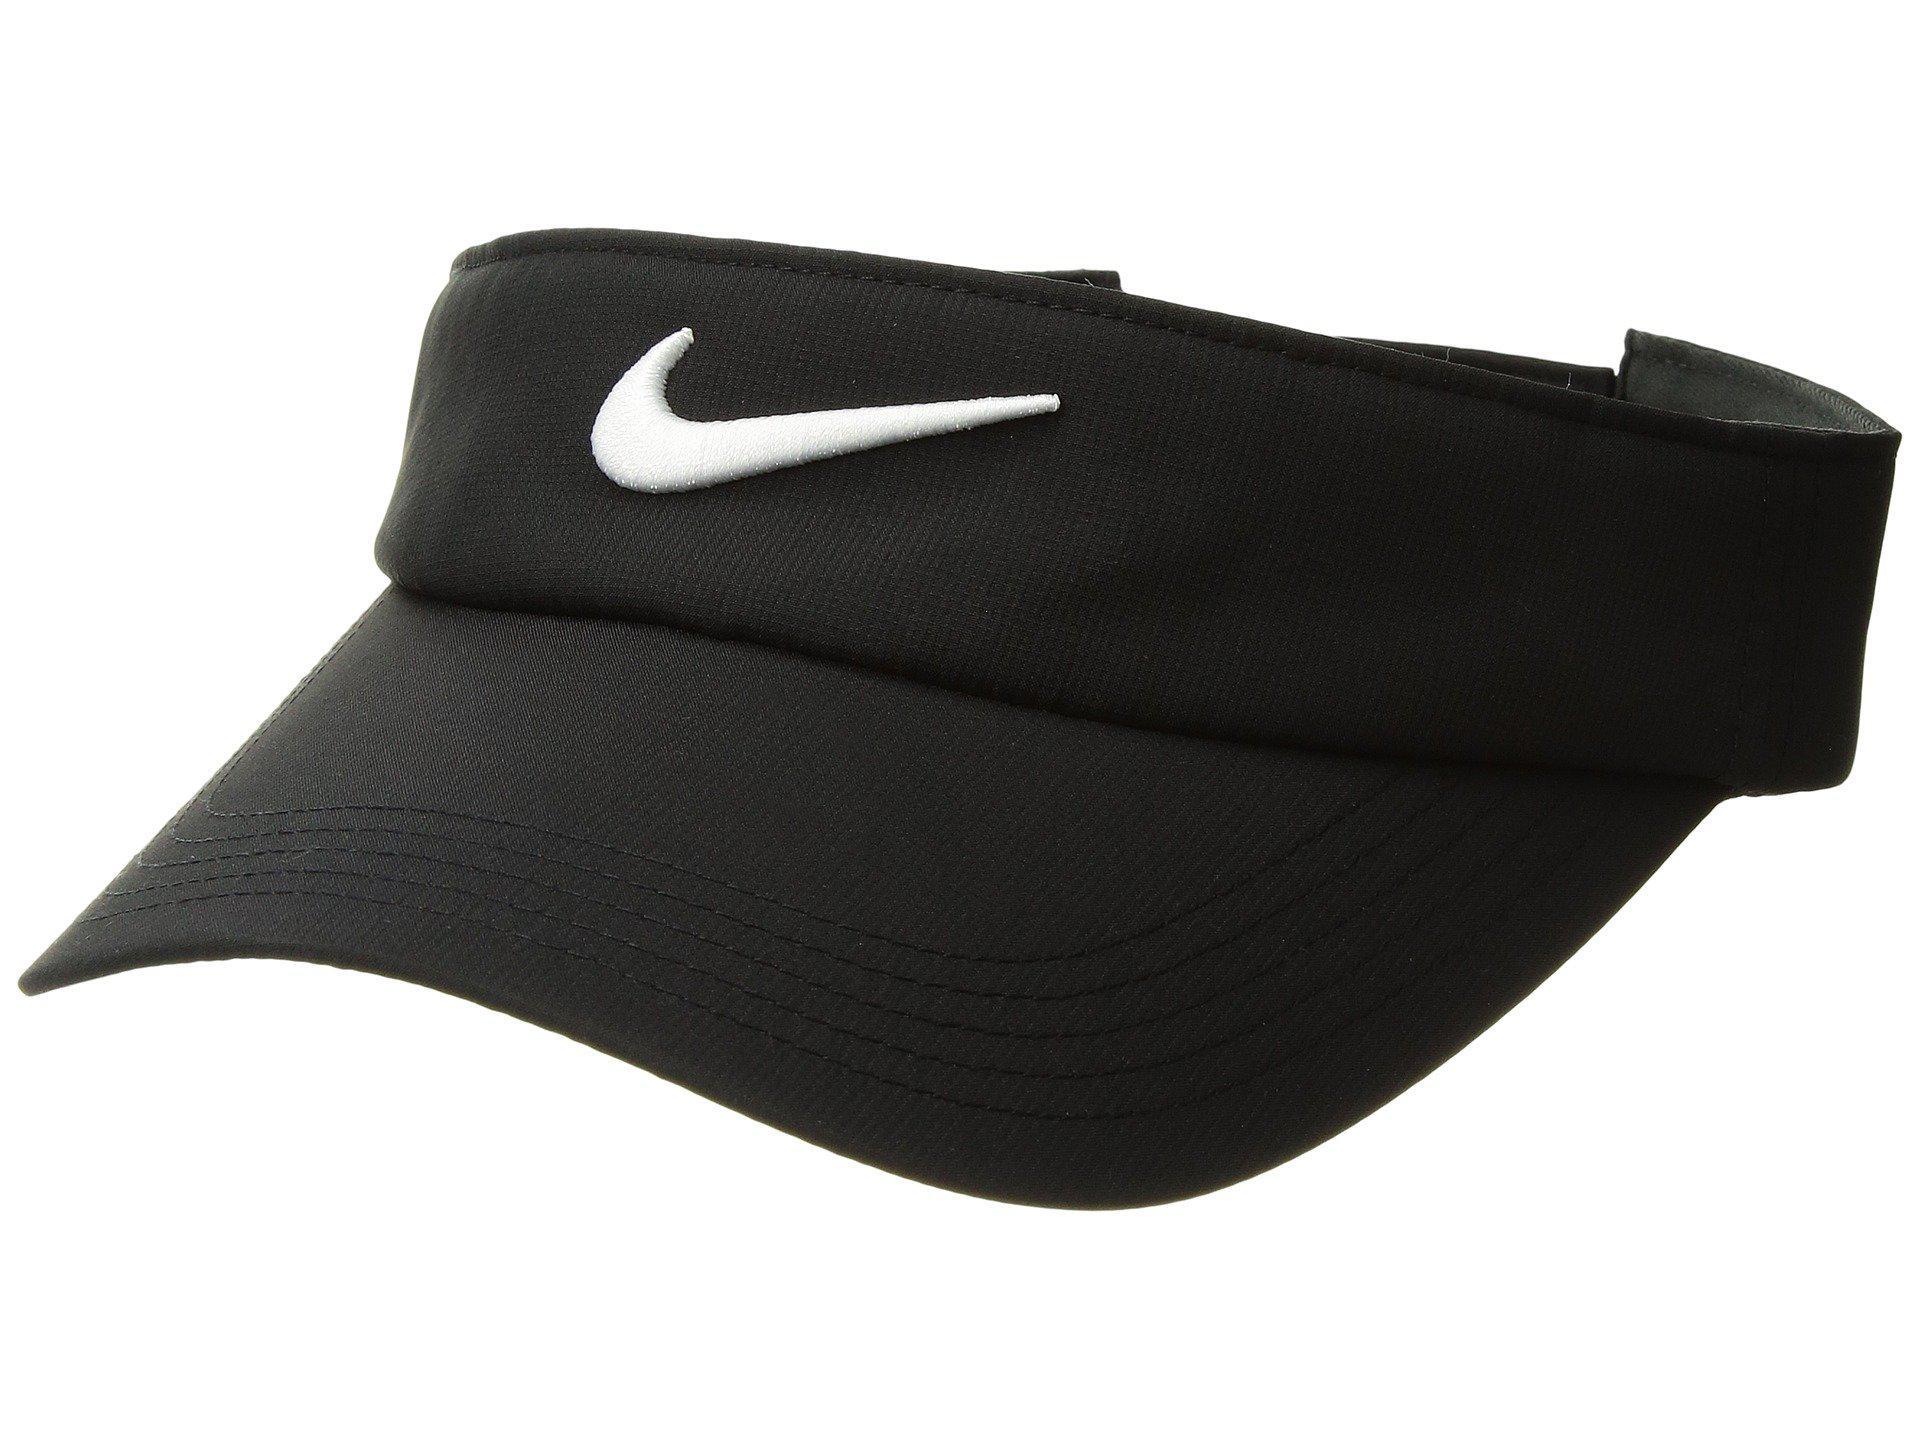 Lyst - Nike Visor Core (black anthracite white) Caps in Black dc8eb2b4441